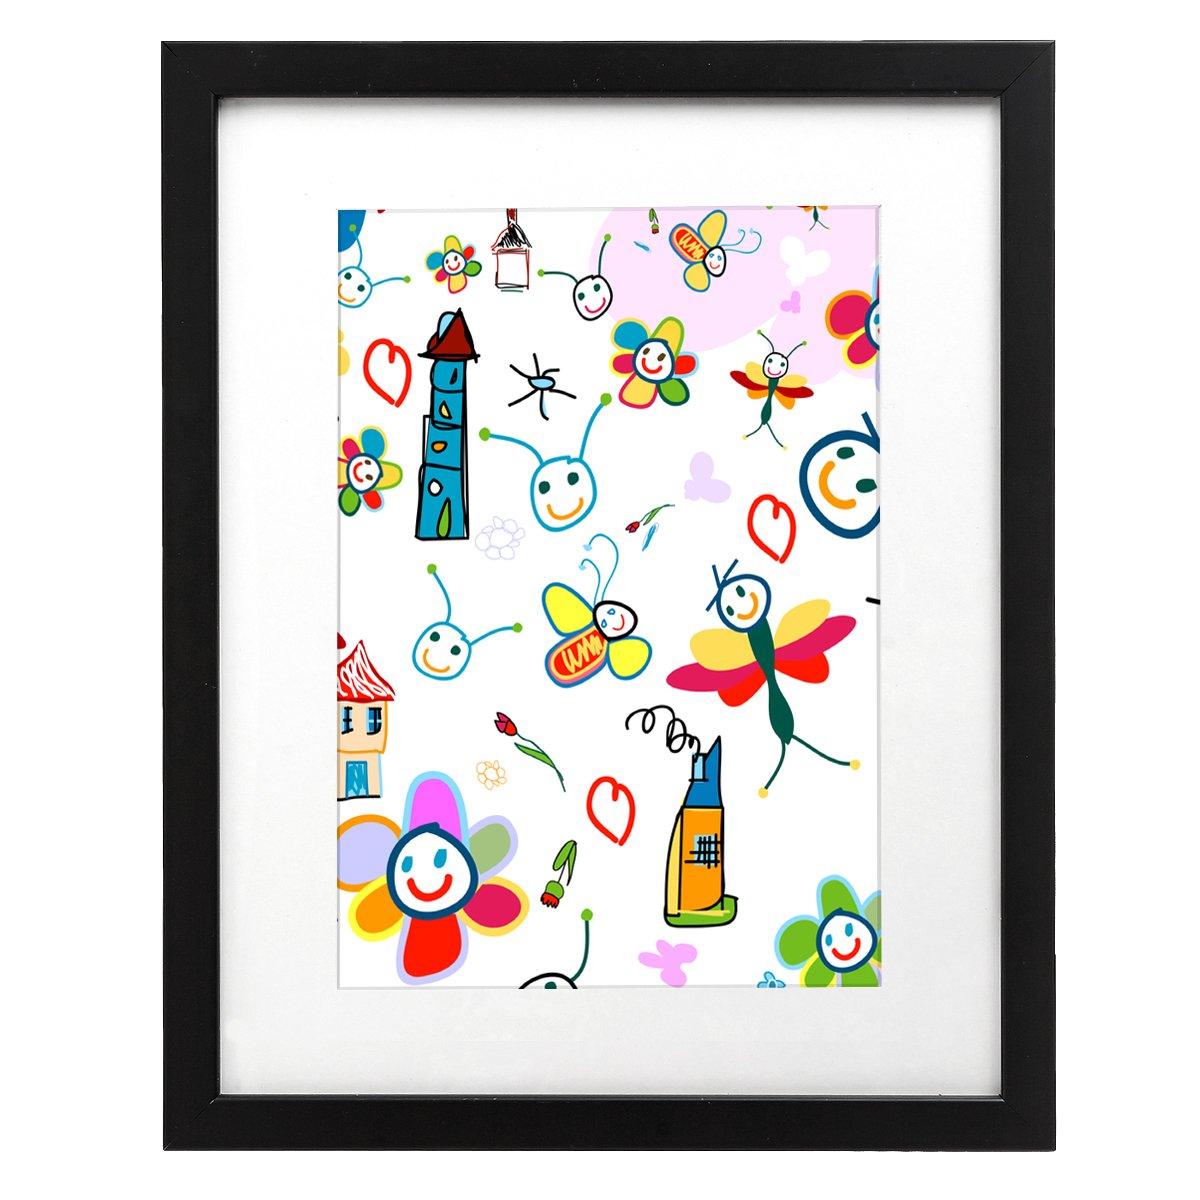 Amazon.com : Kids Artwork Frame - 11x14 Inch Black Picture Frame ...